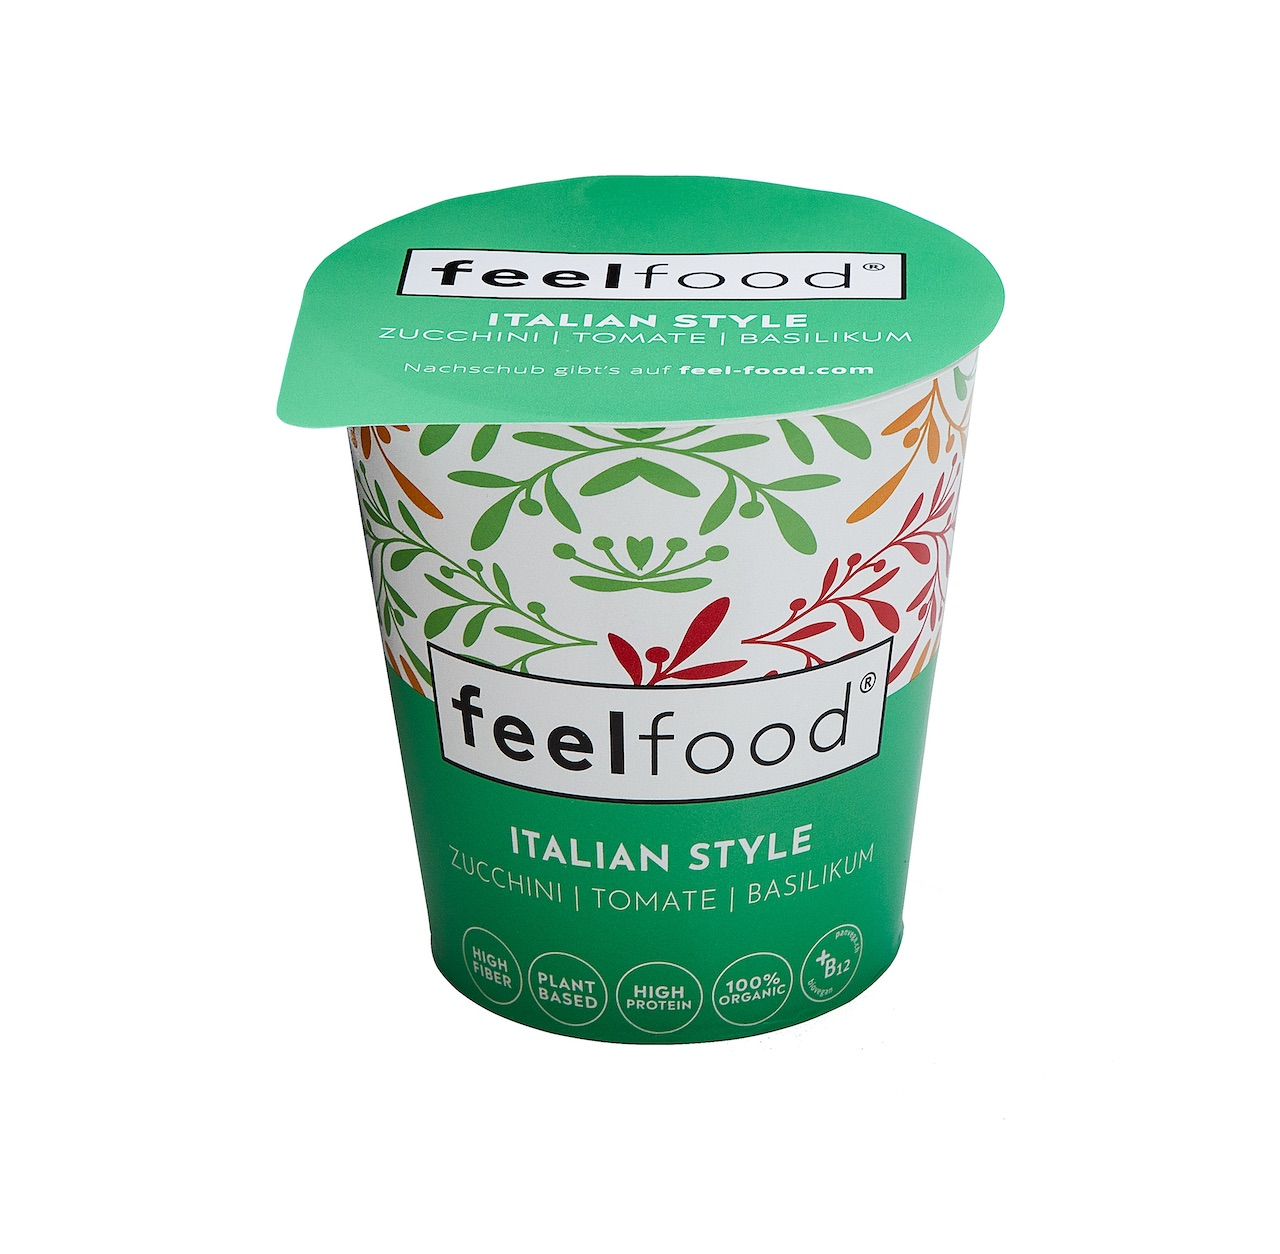 feelfood Italian Style